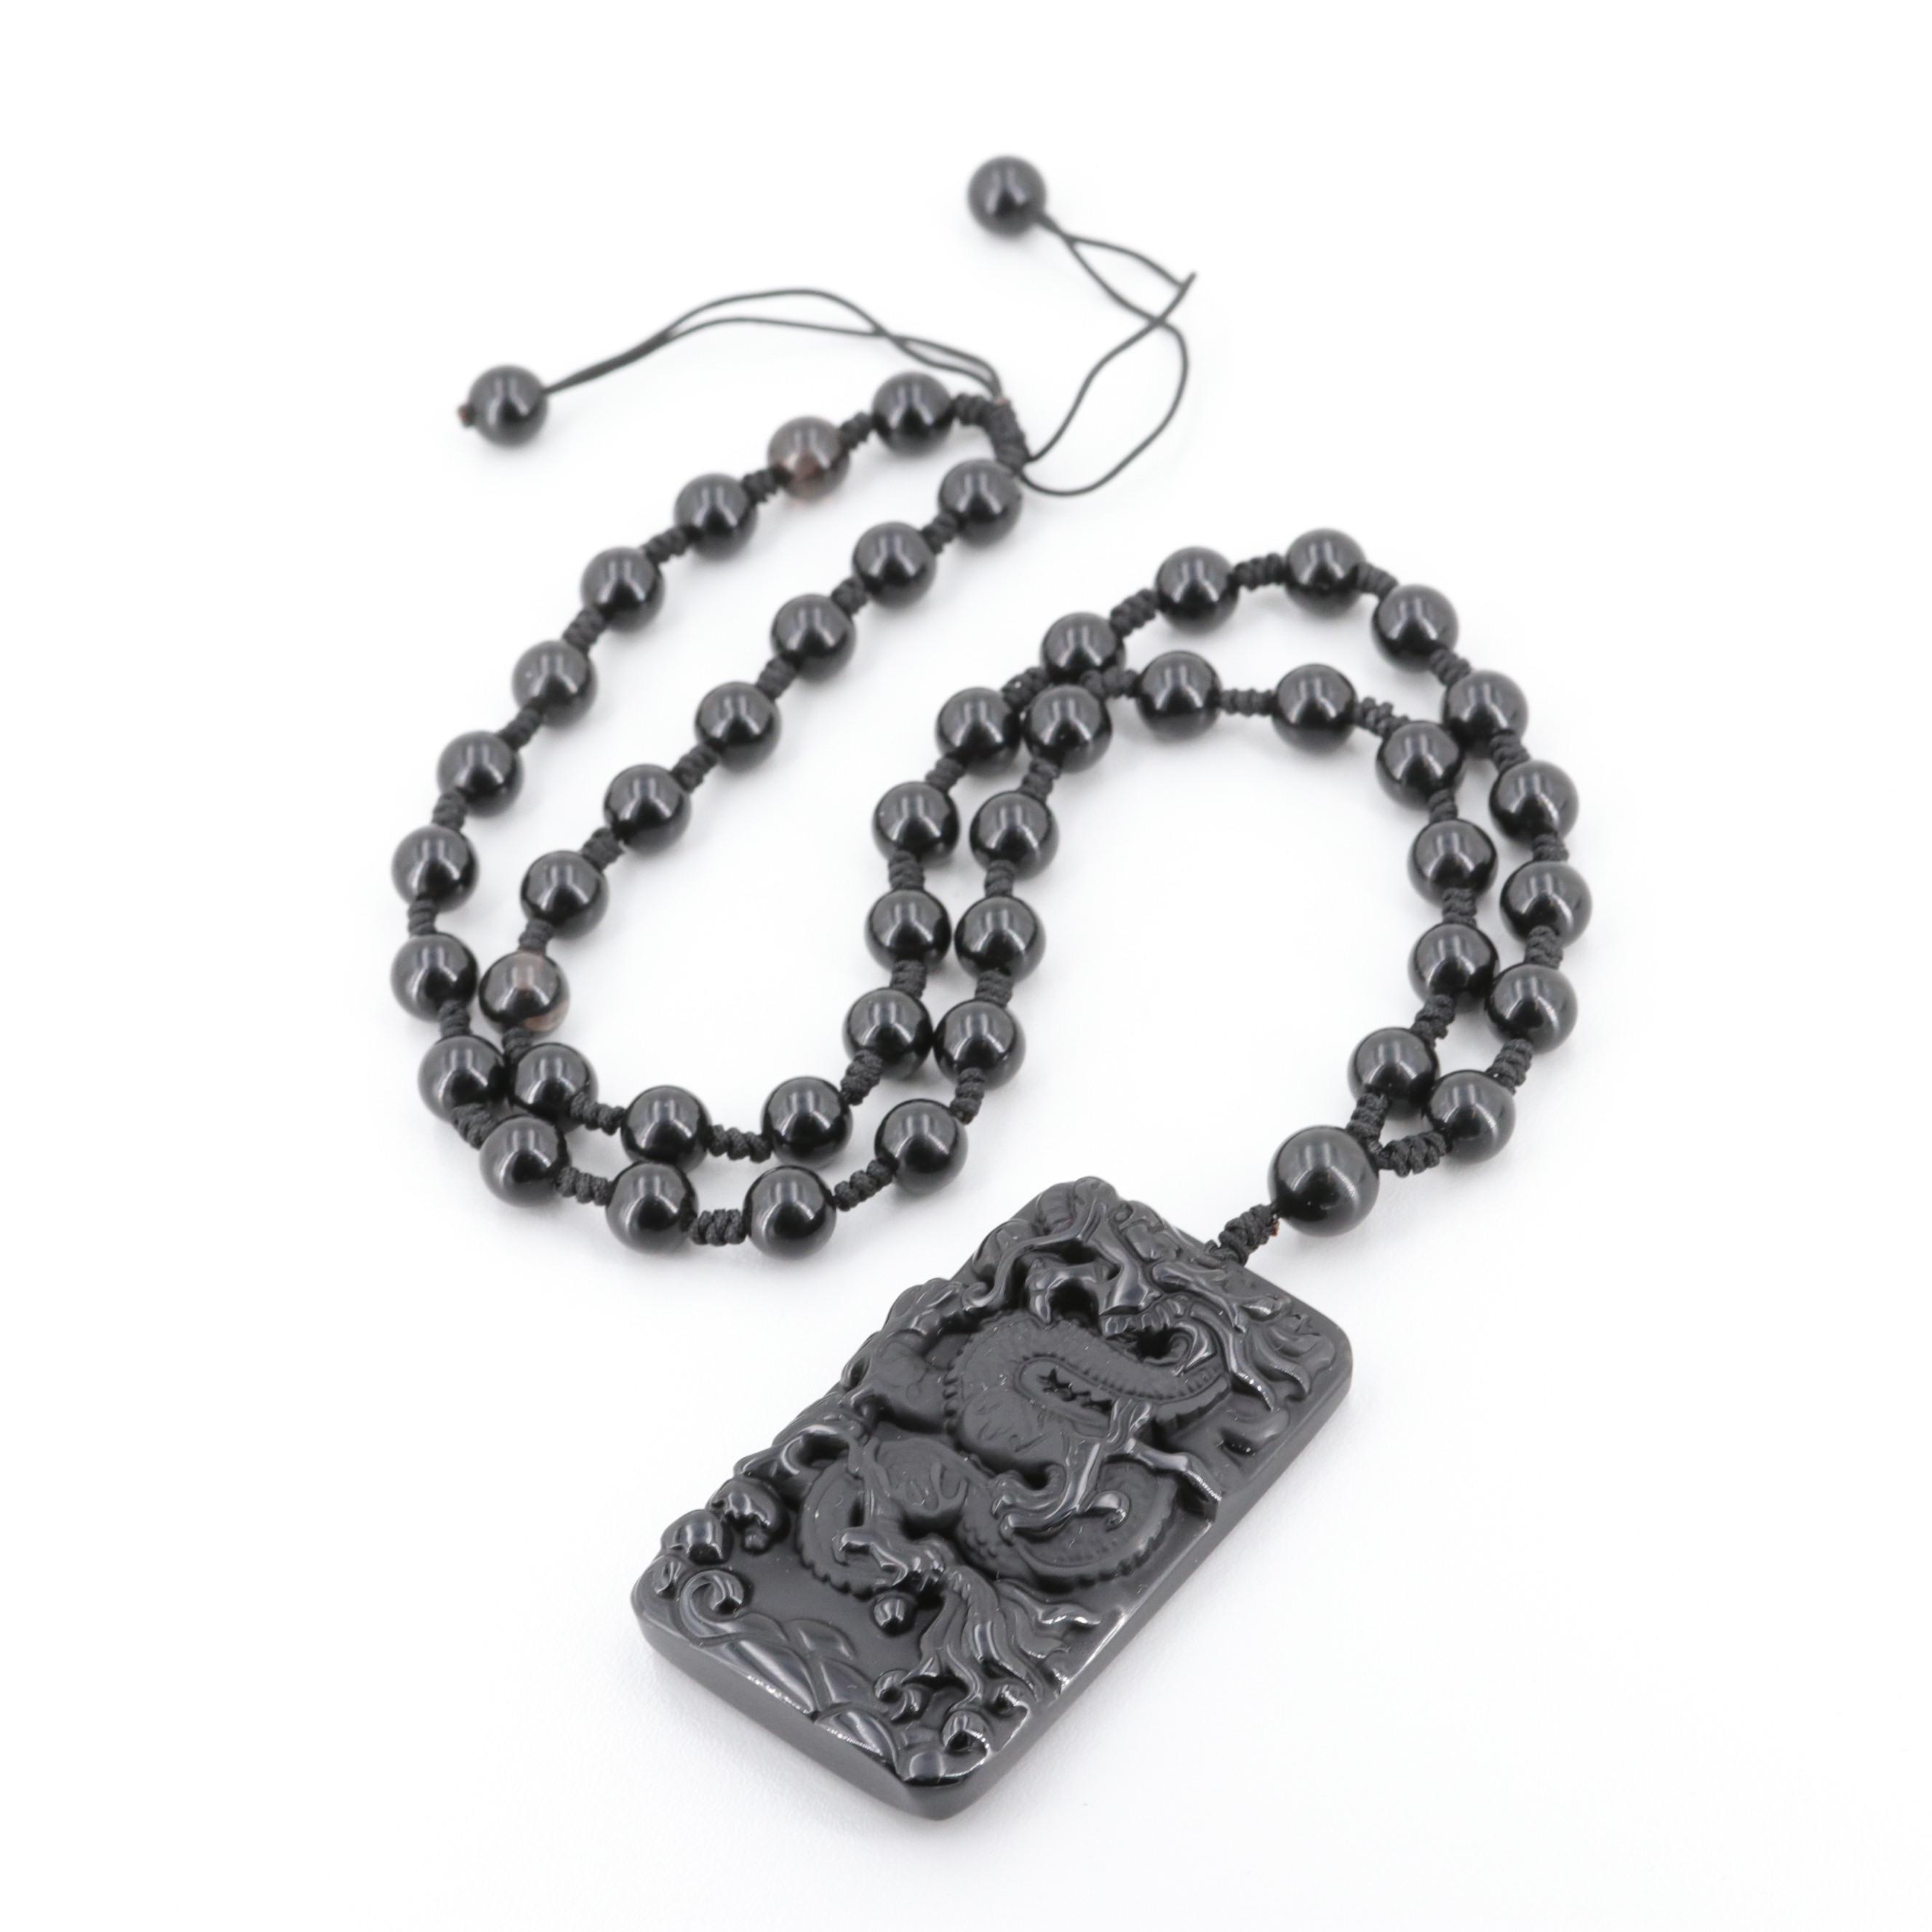 Black Onyx Asian Style Dragon Pendant Necklace